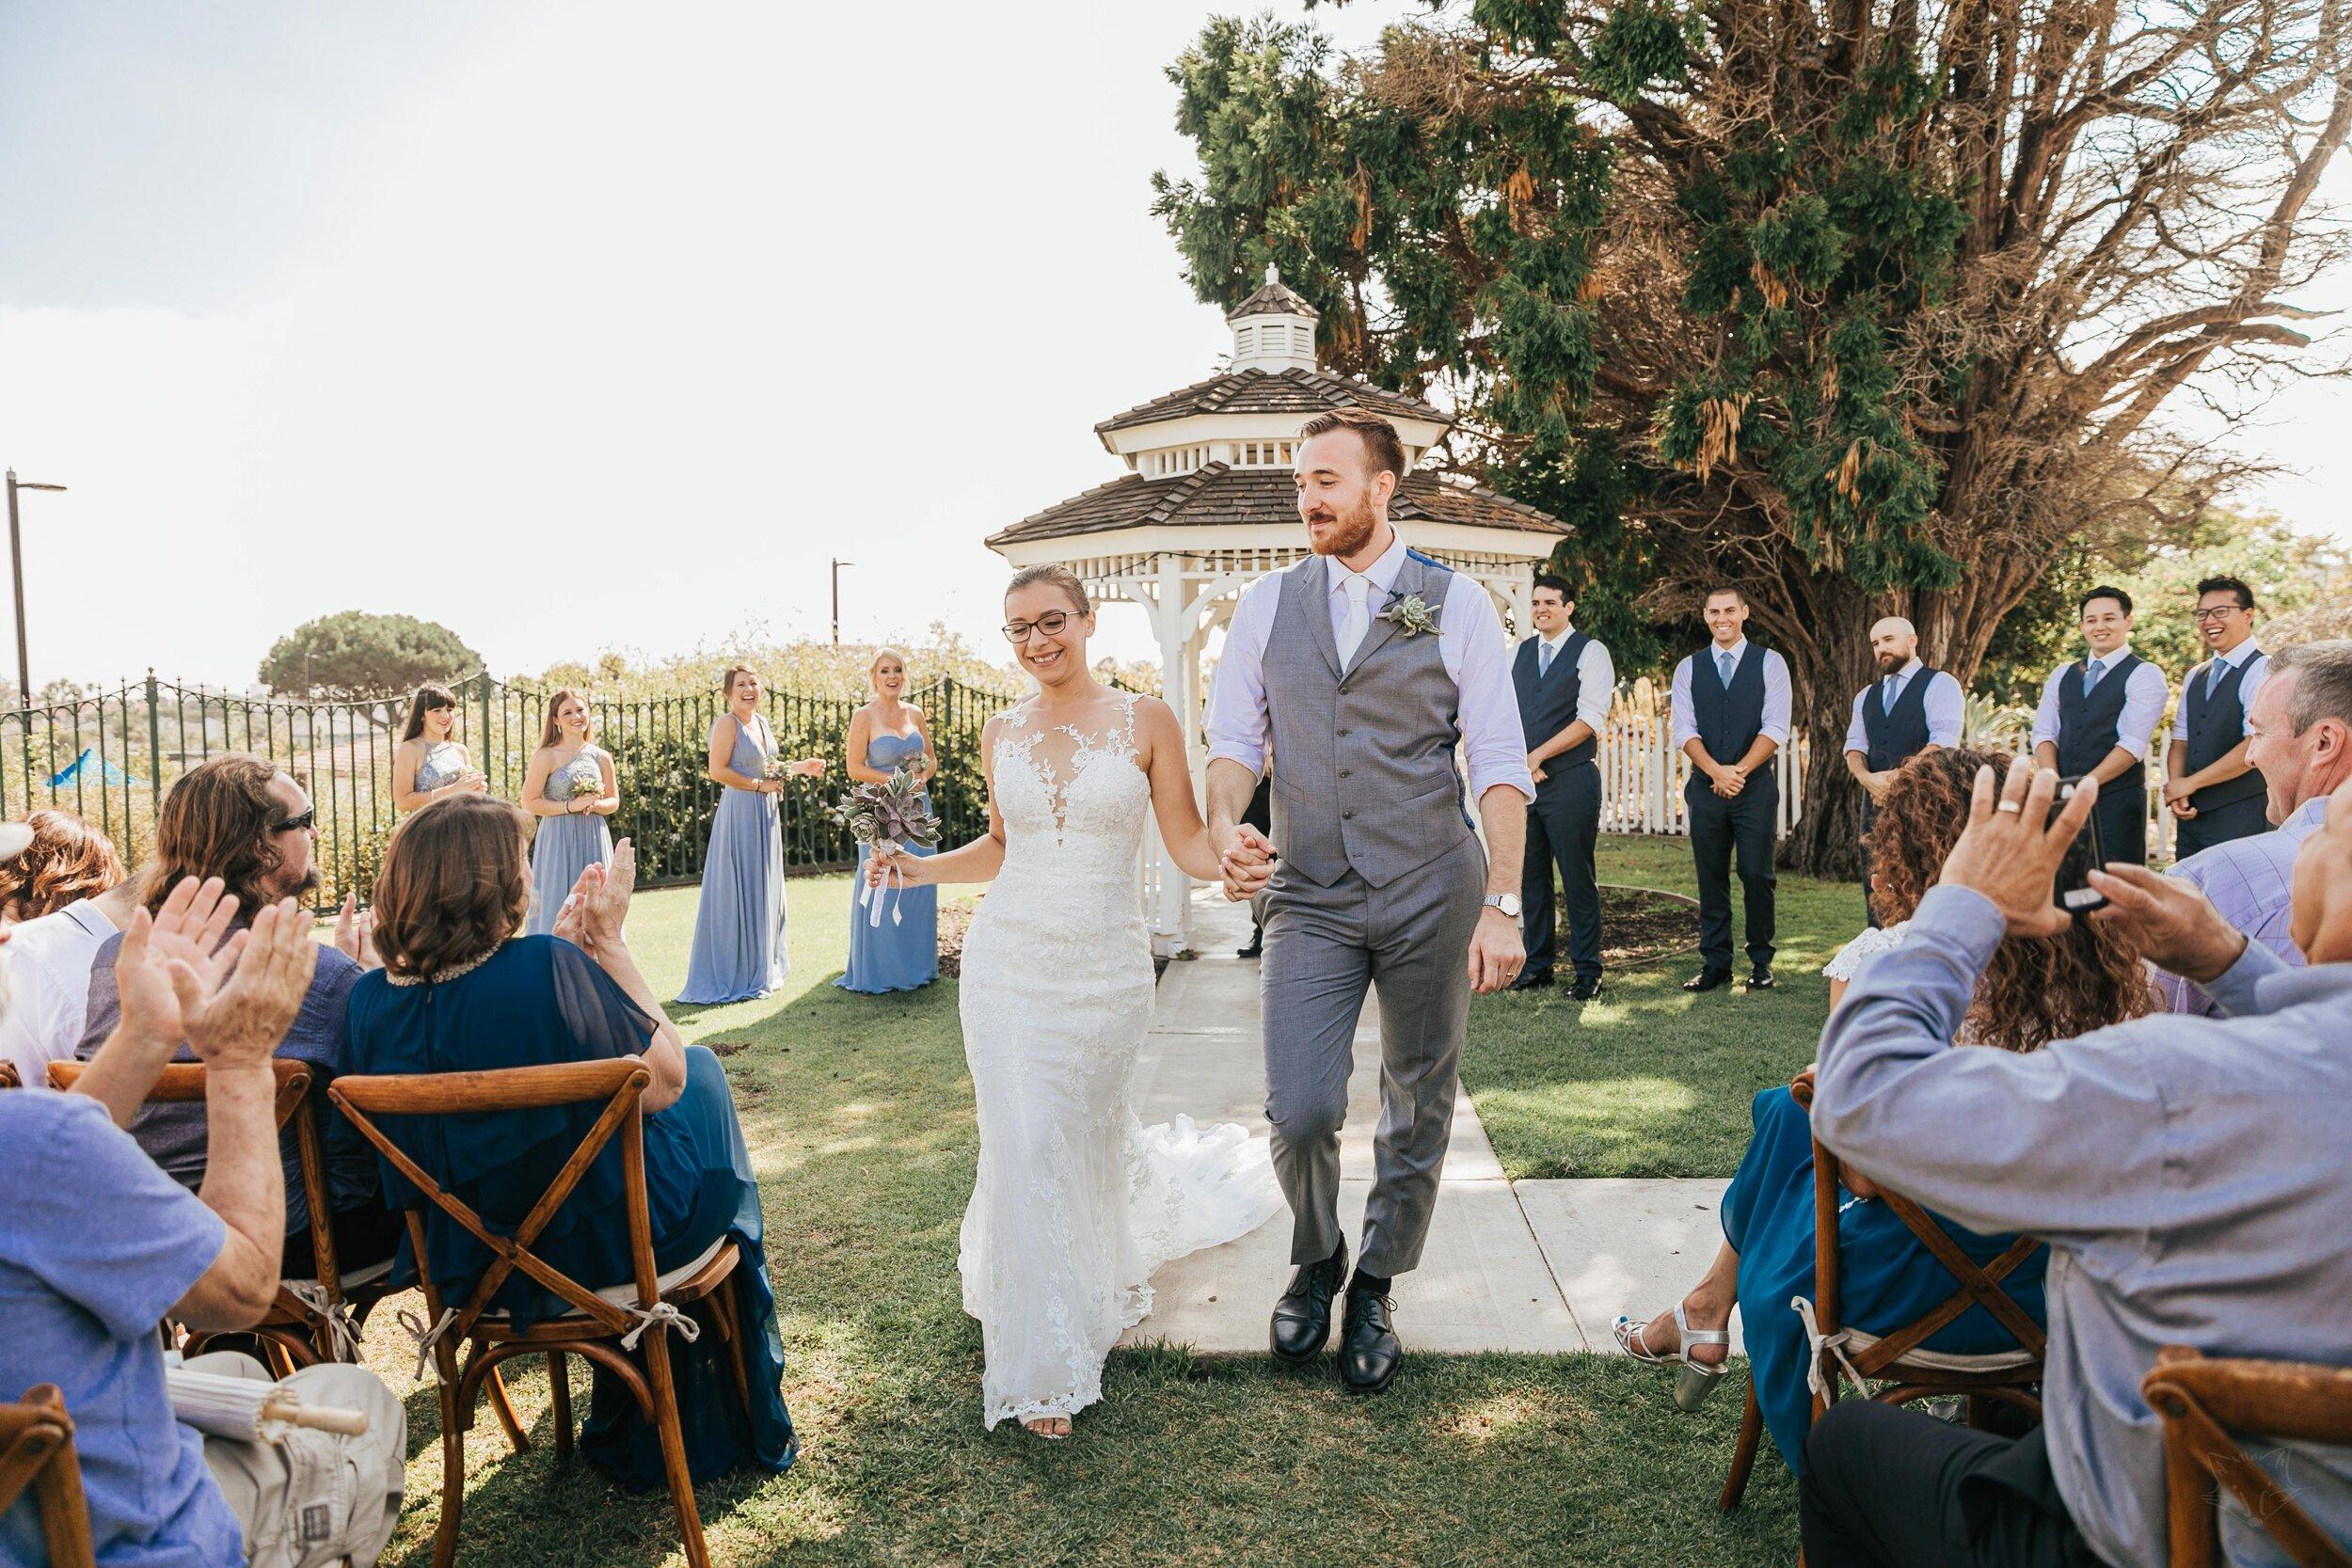 newland_barn_hungtington_beach__photoshoot_joshuachun_wedding-0464.jpg